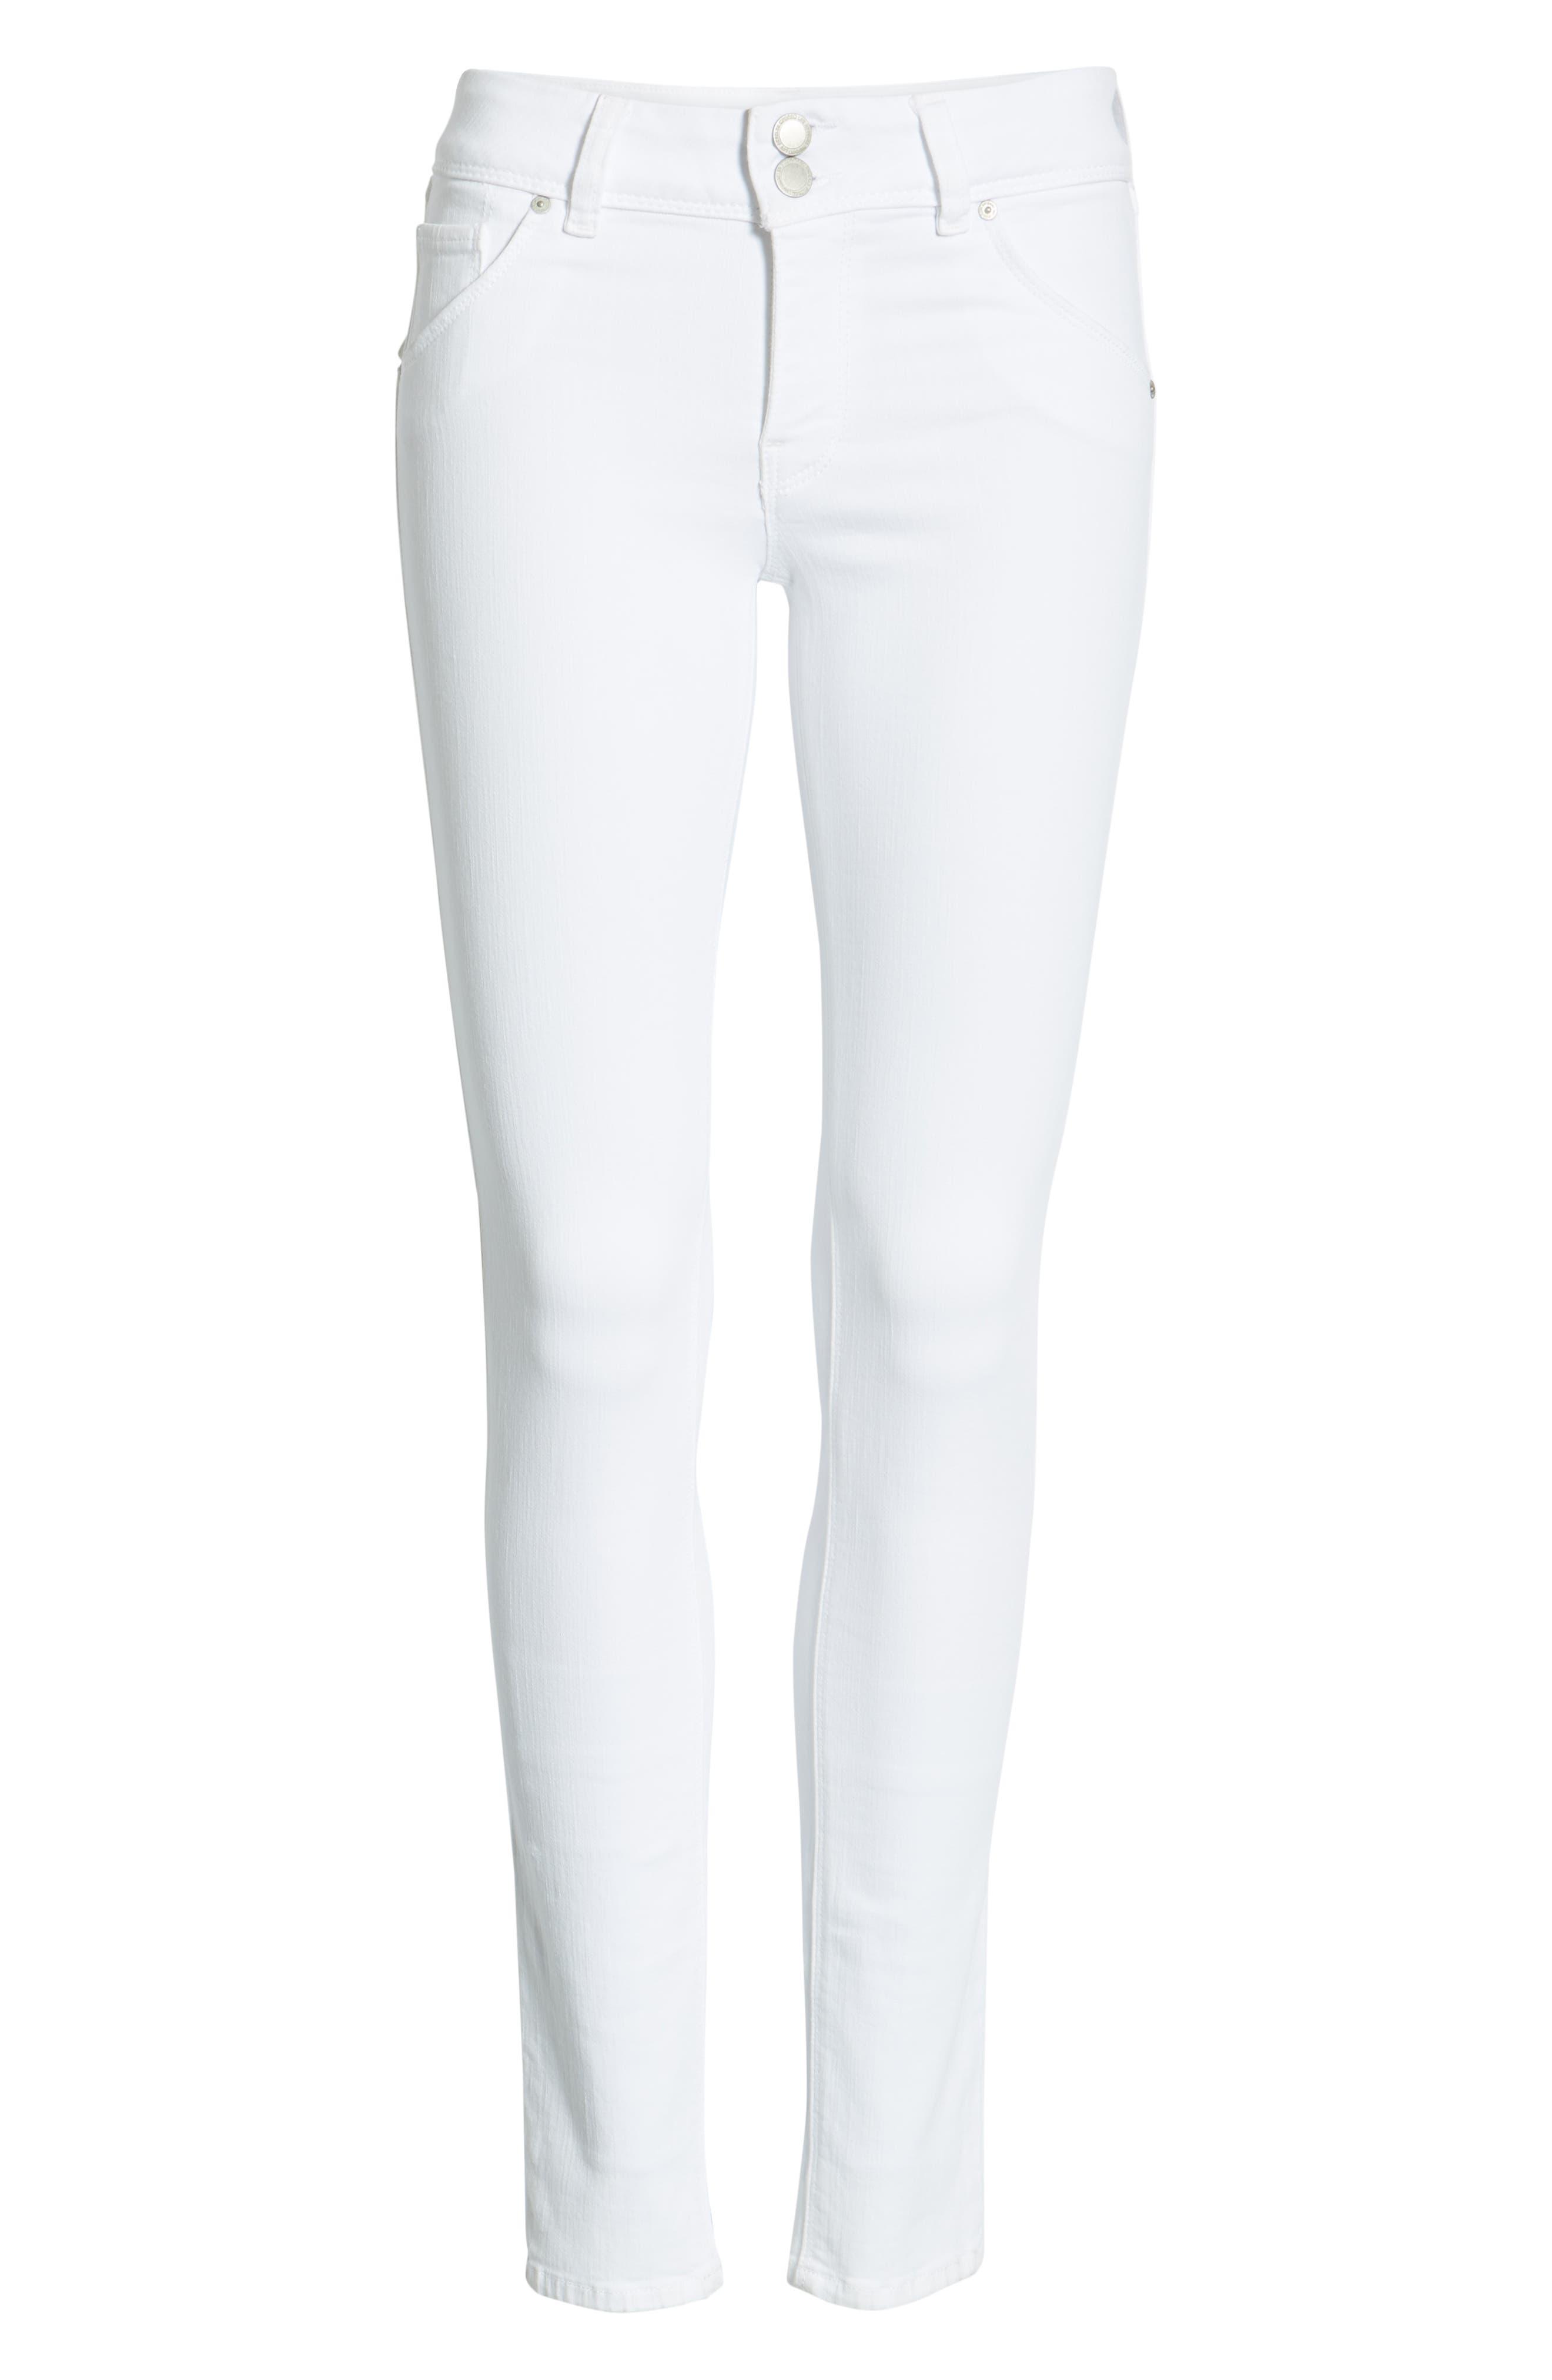 HUDSON JEANS,                             Collin Skinny Jeans,                             Alternate thumbnail 7, color,                             WHITE